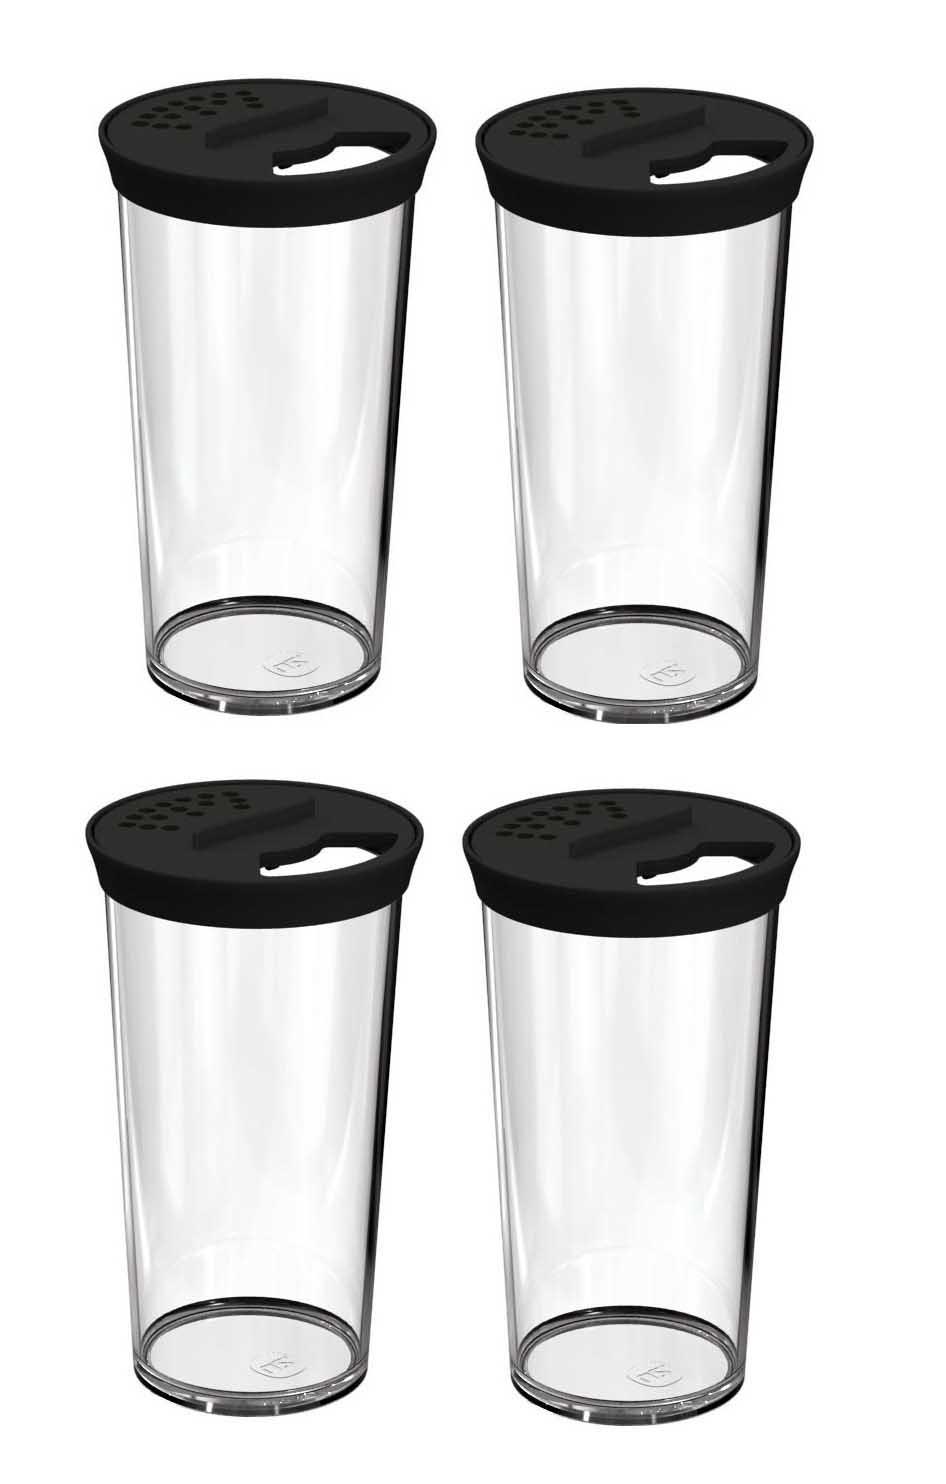 Kit 4 Farinheiros Porta Condimentos 500ml Plástico Uz Preto